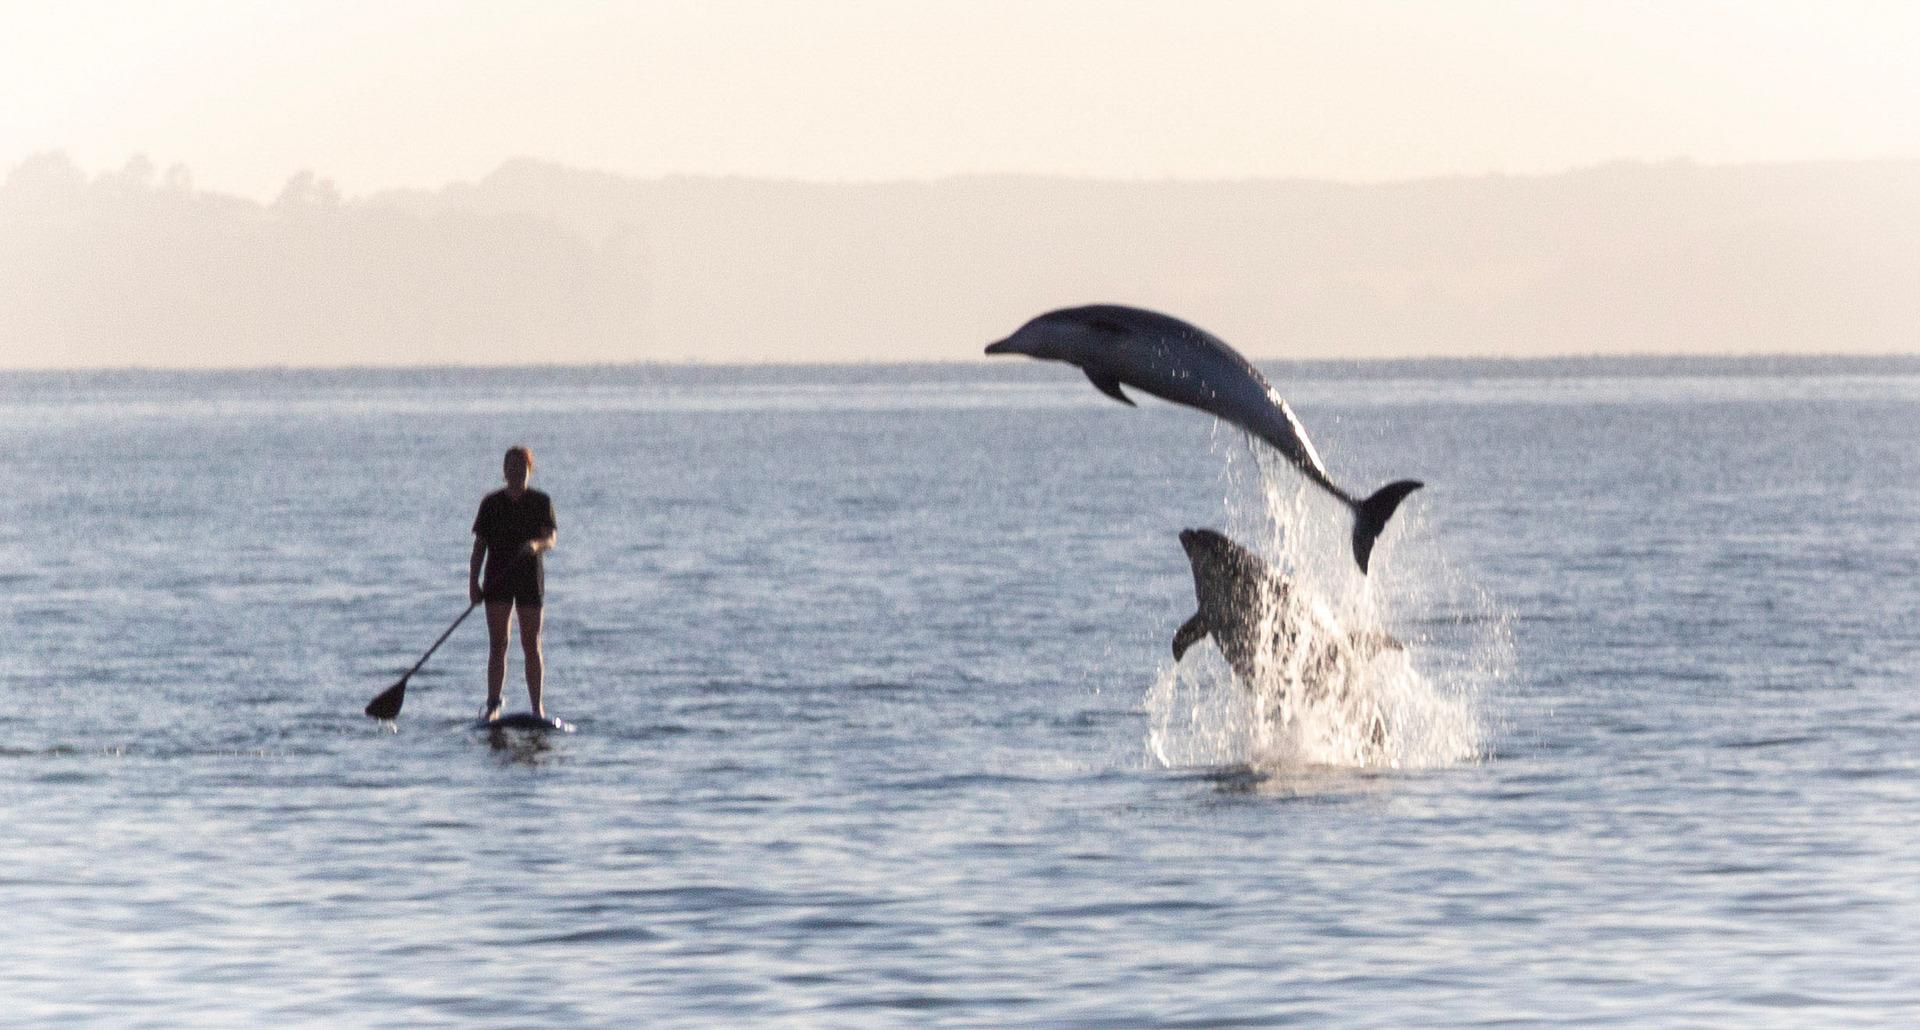 Rare sighting of dolphin pod making a splash at Mairangi Bay Beach, Auckland